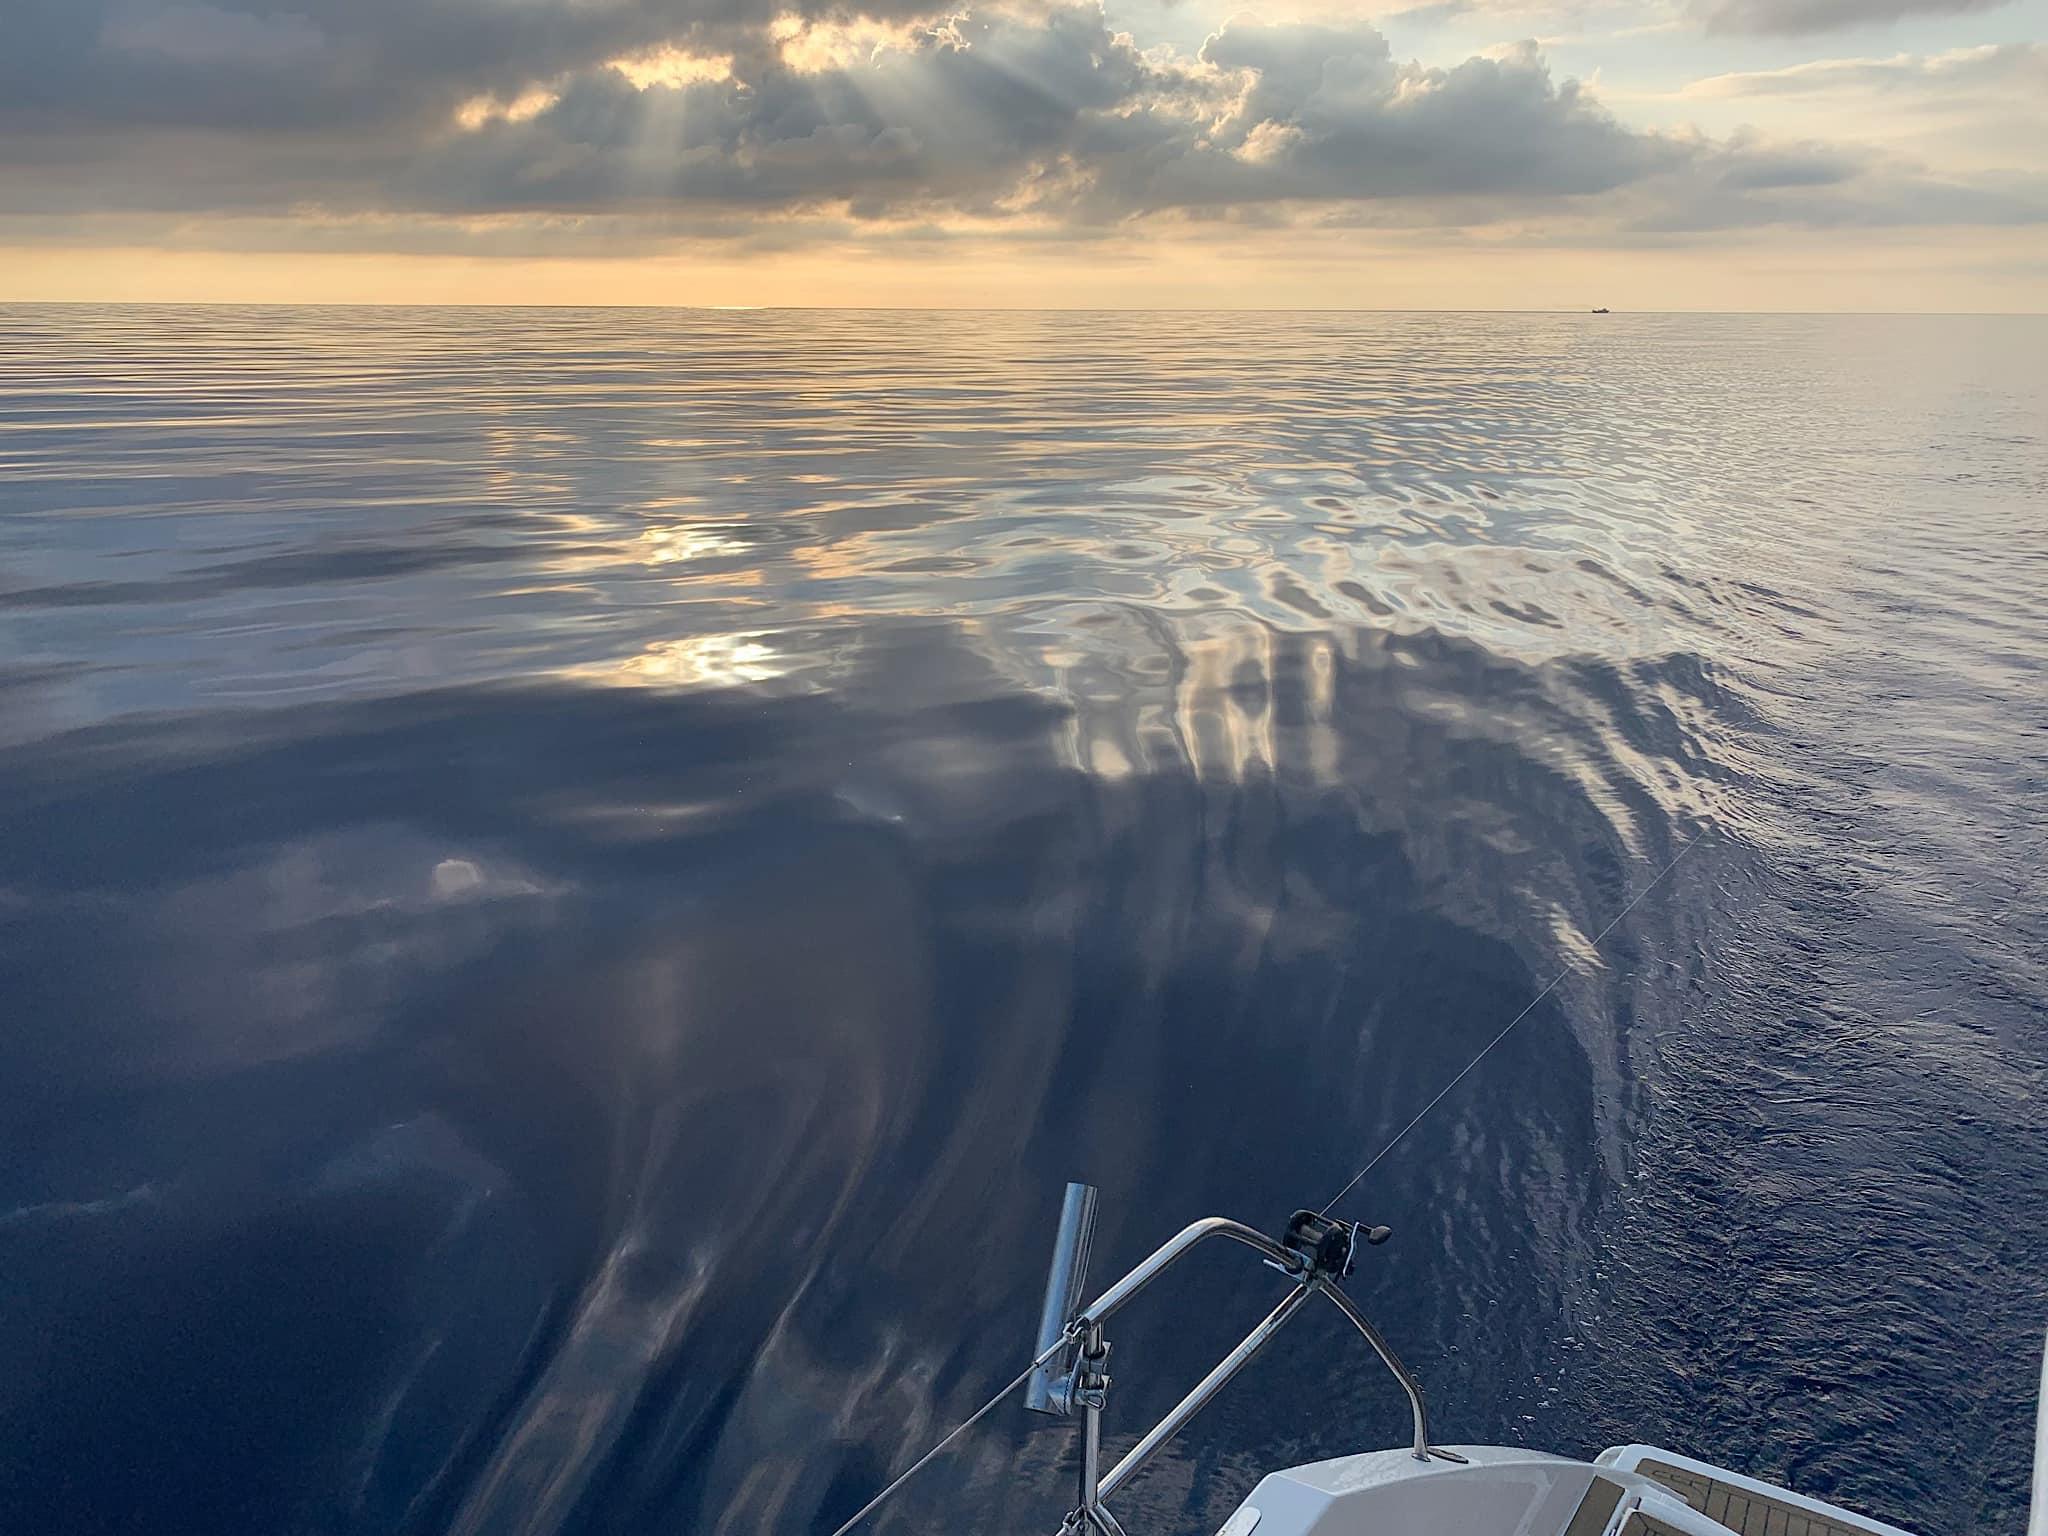 штиль море